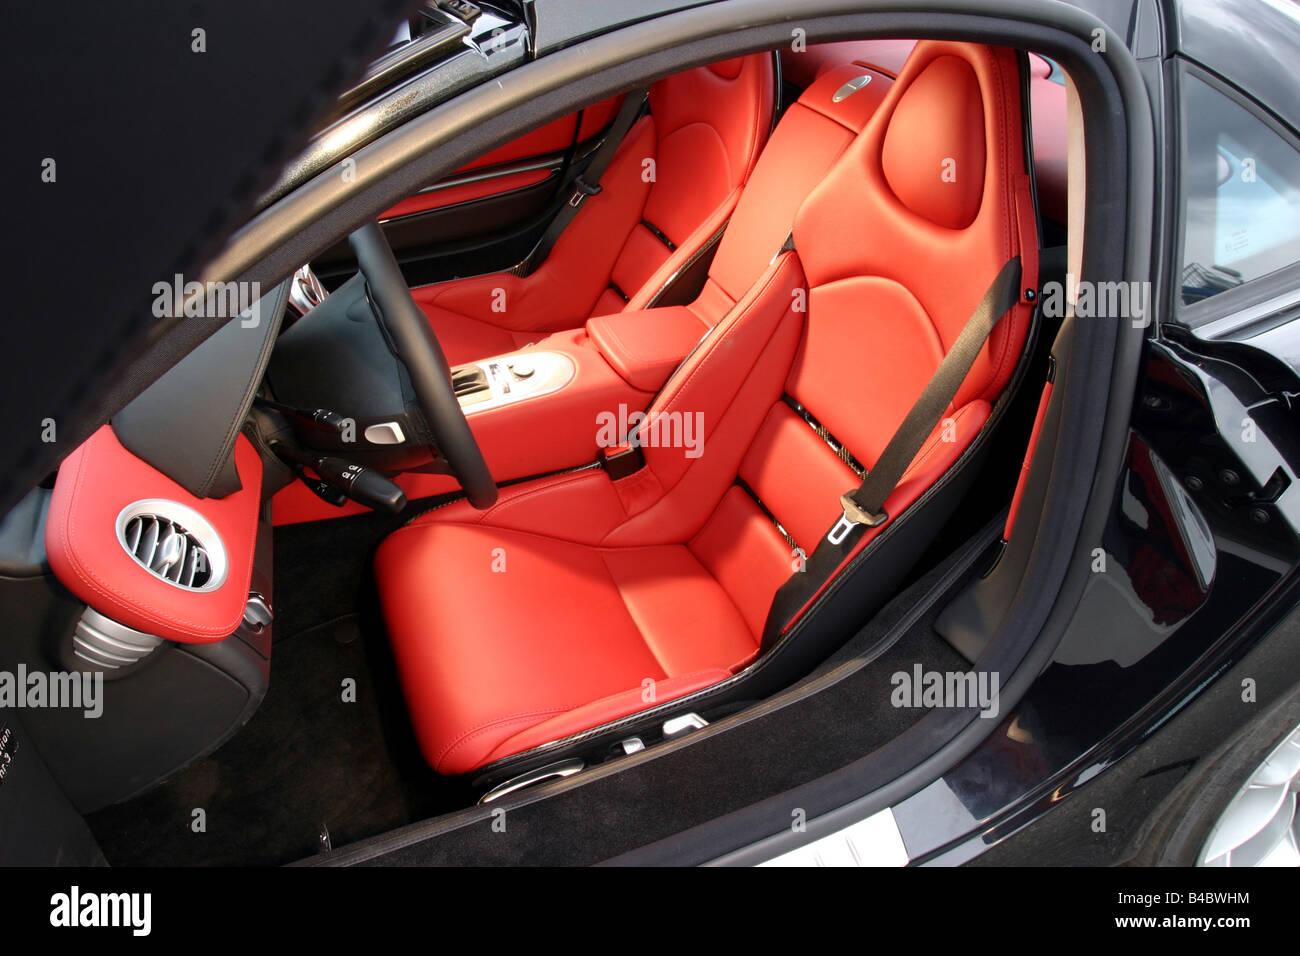 mercedes mclaren interior. car mercedes slr mclaren coupecoupe roadster model year 2003 interior view seats front seat driveru0027s se mclaren